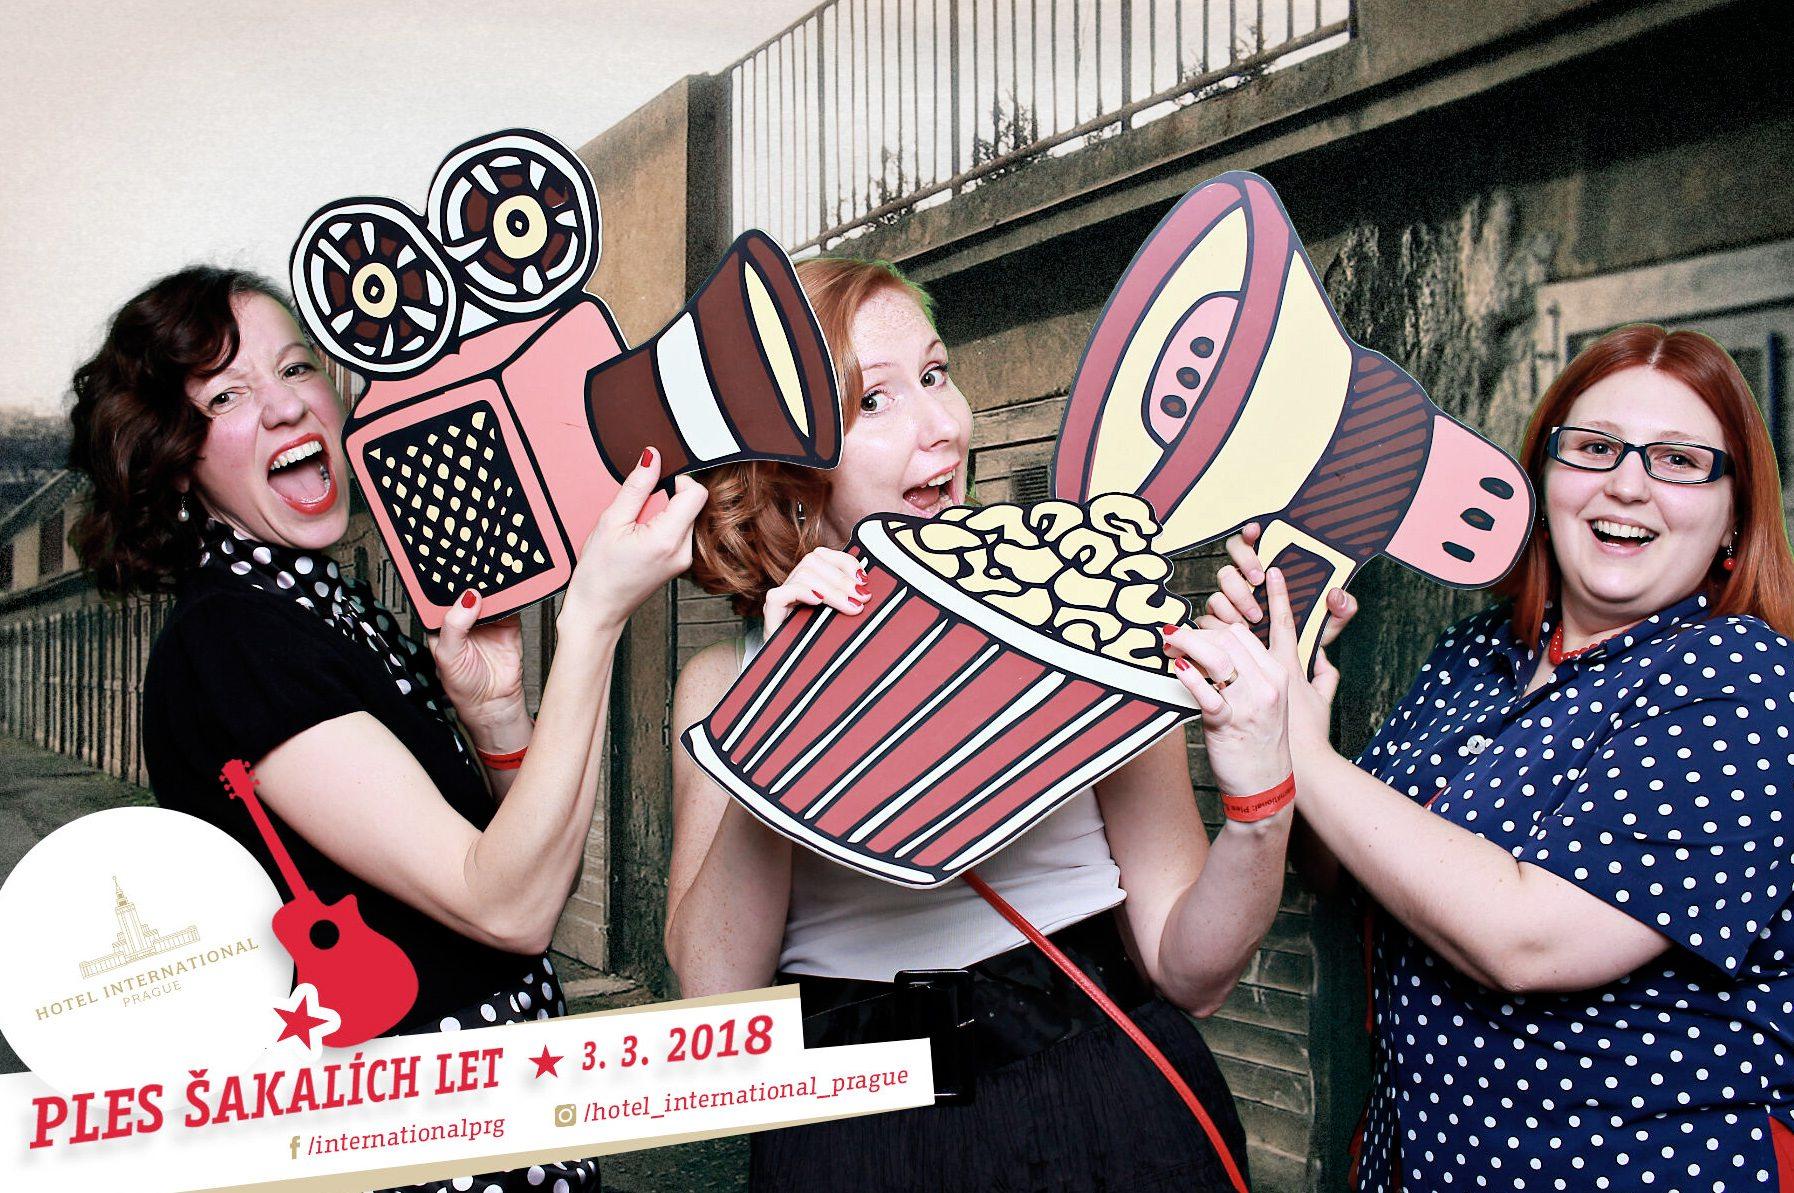 fotokoutek-hotel-international-ples-sakalich-let-3-3-2018-397552